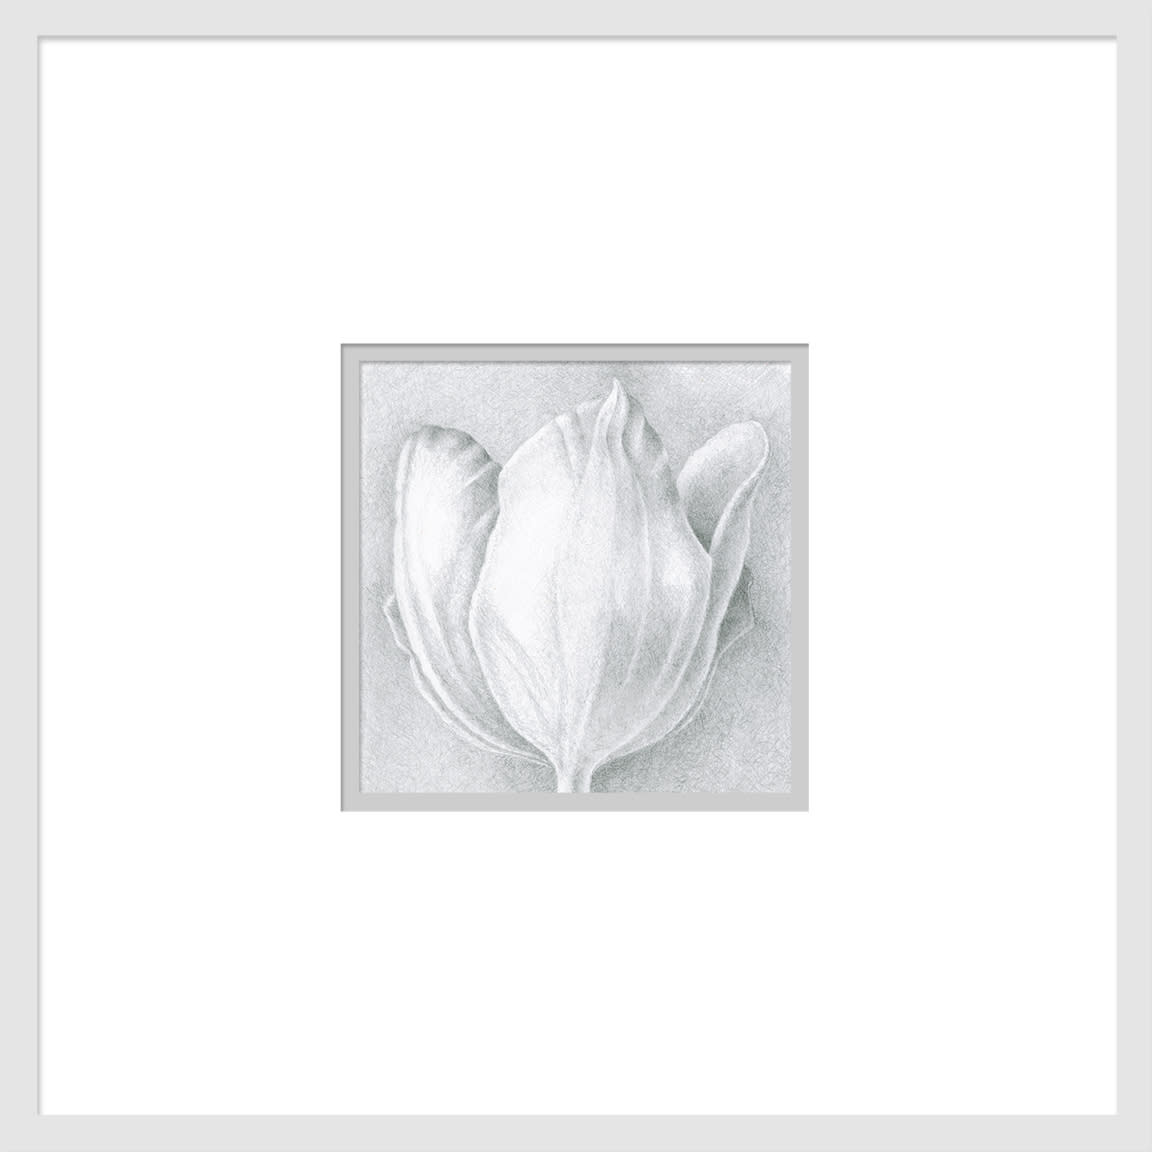 080701 orange tulip drawing series  1 6x6 matted to 16x16 e6ykuh